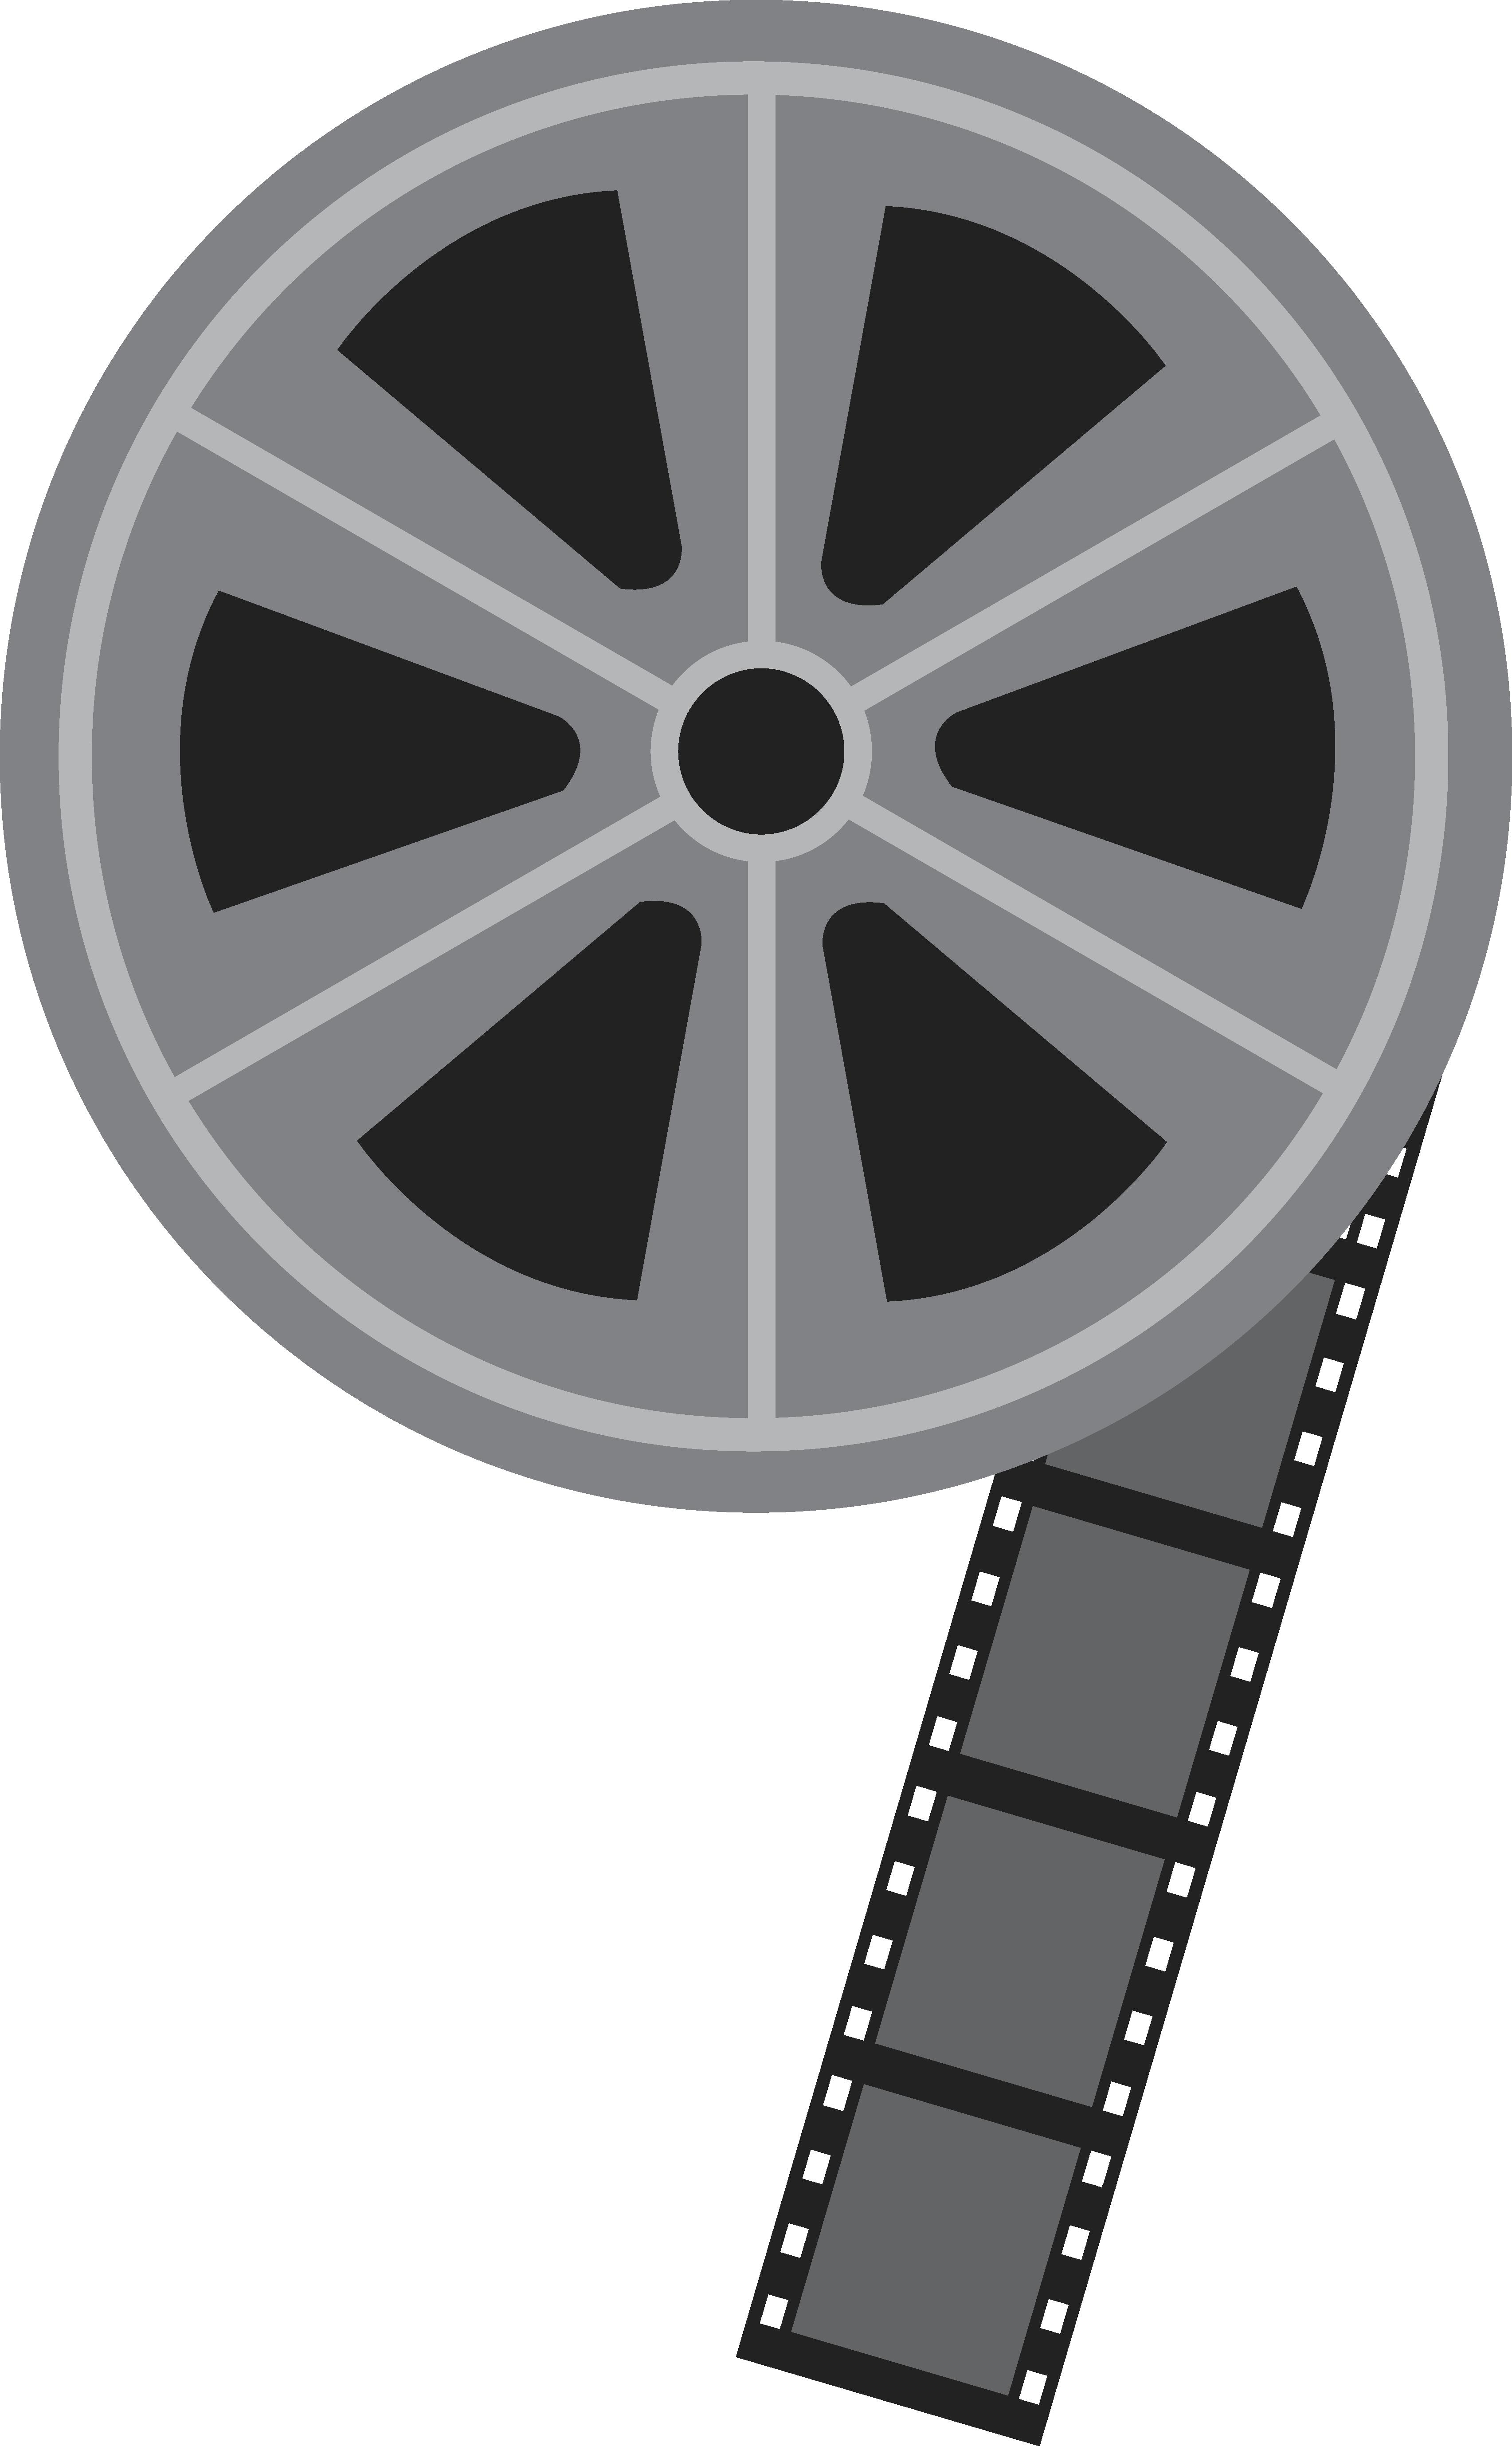 Movie clipart movie theater. Clip art tape measure